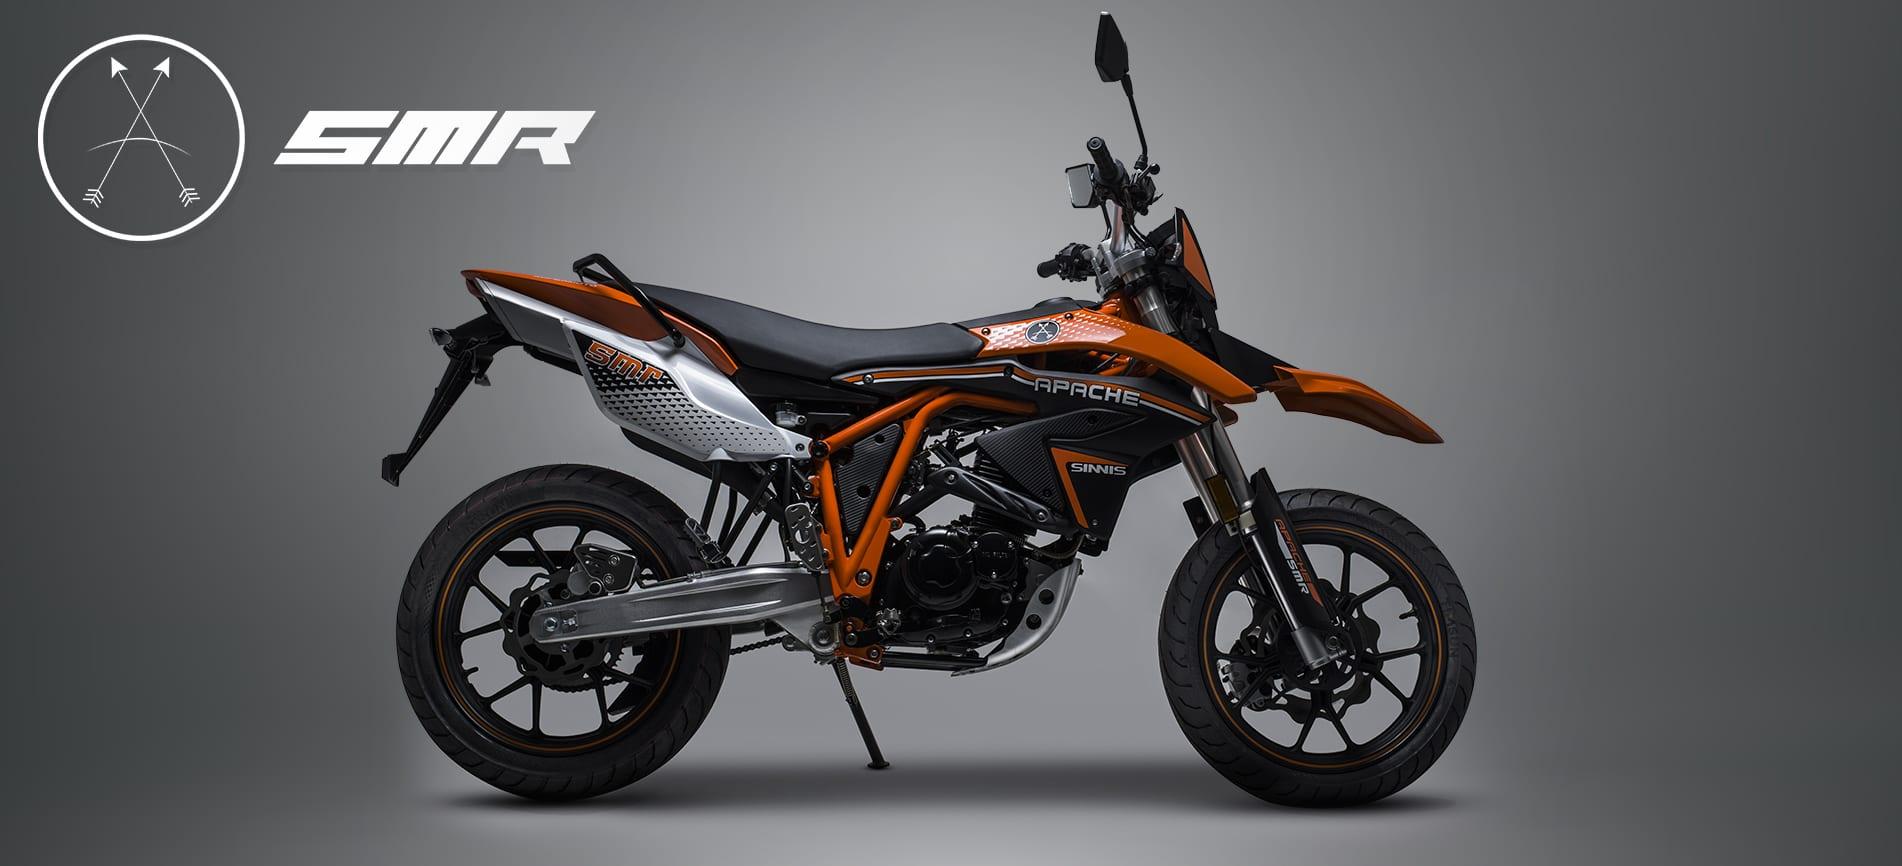 Sinnis Apache SMR 125cc Motorcycles Motorbike Orange and Black